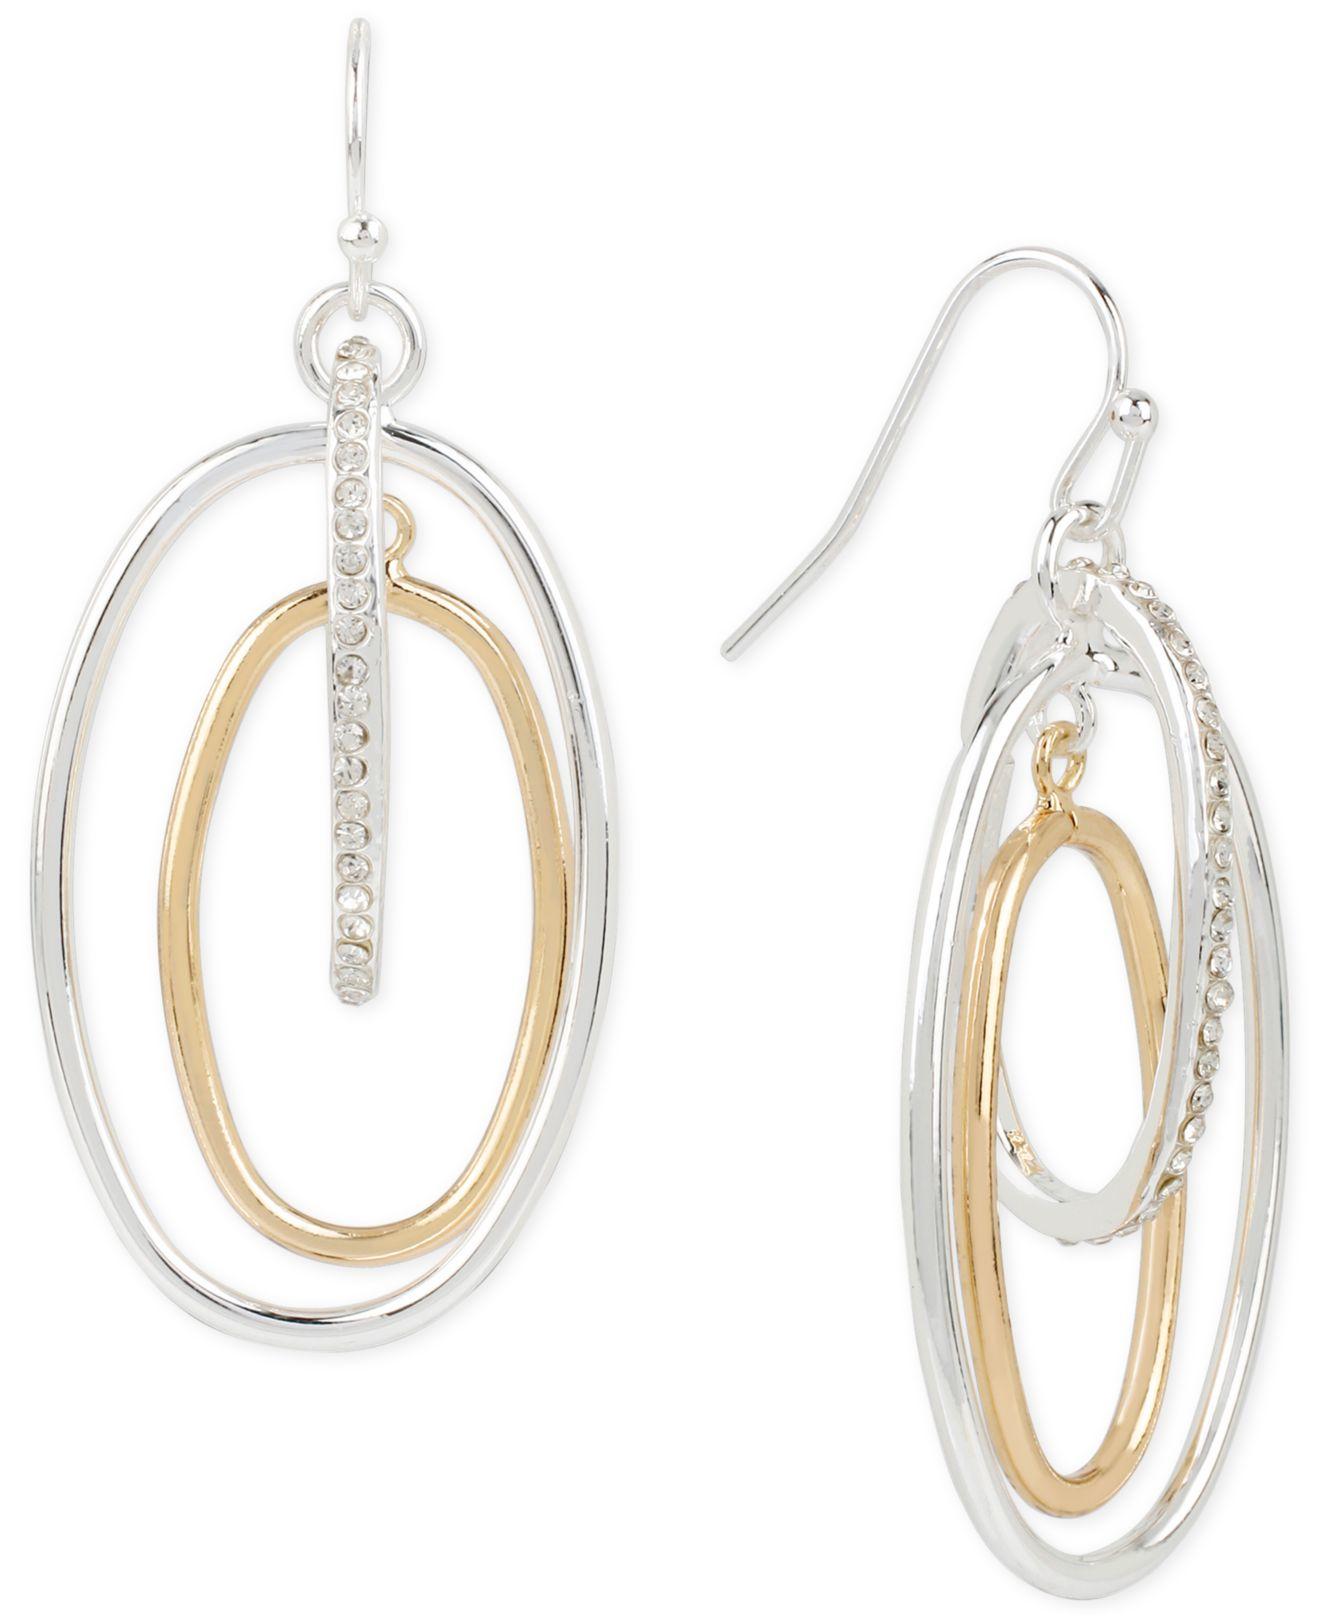 touch of silver pave orbital drop earrings in 14k gold